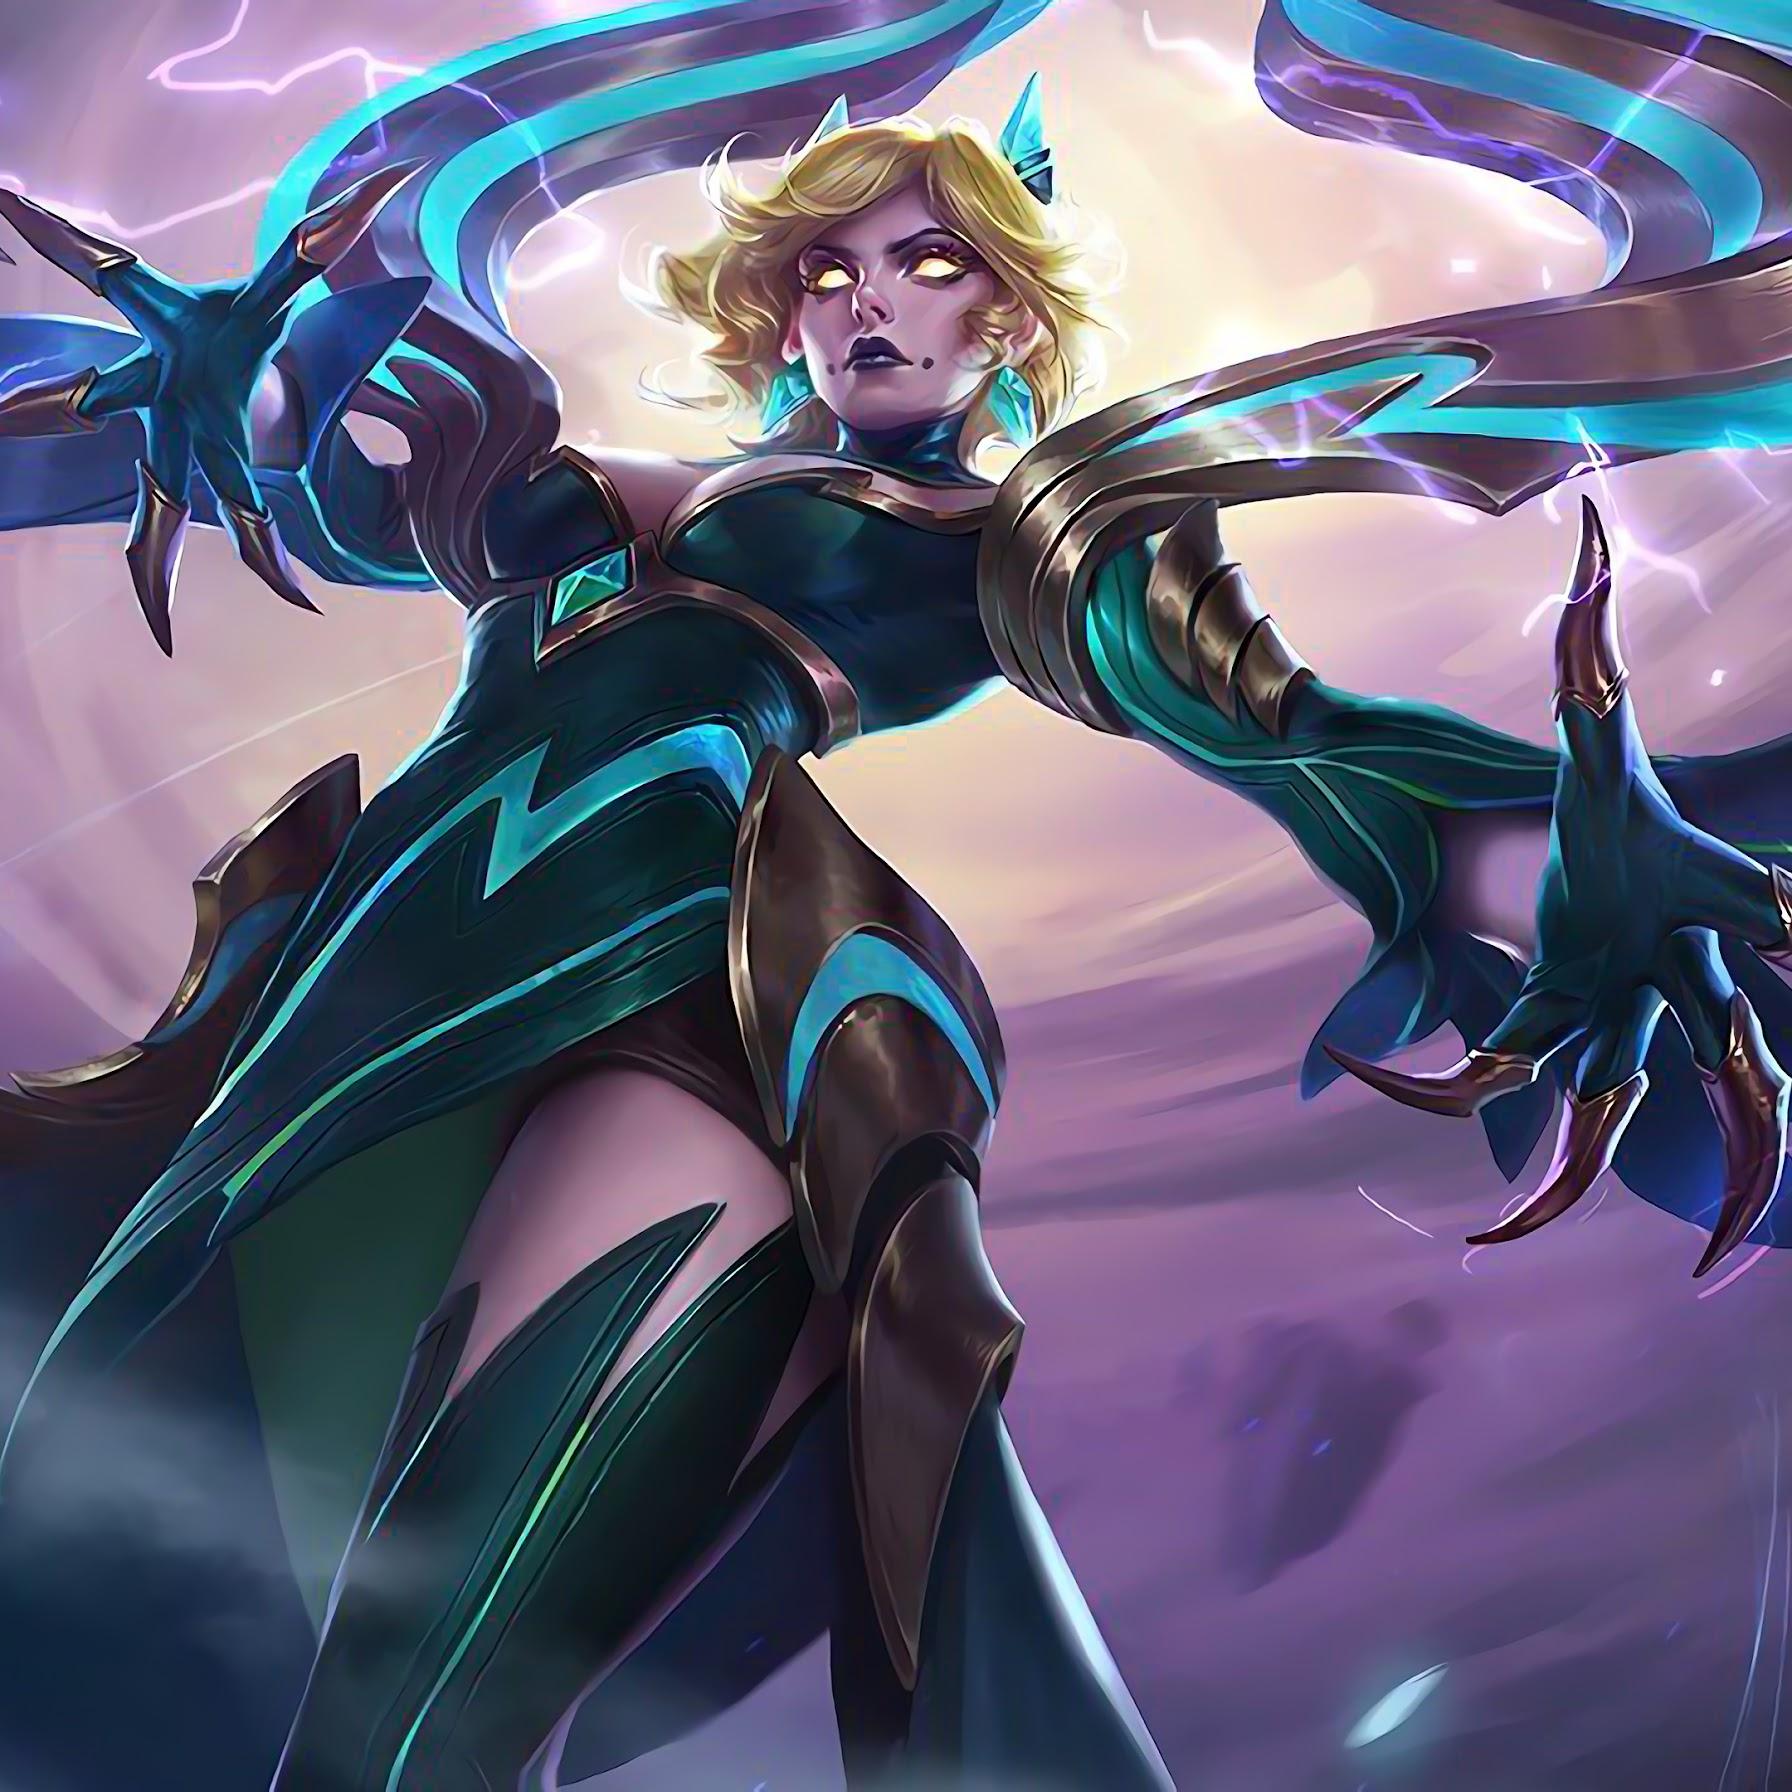 Eudora, Emerald Enchantress, Skin, Mobile Legends, 4K, #81